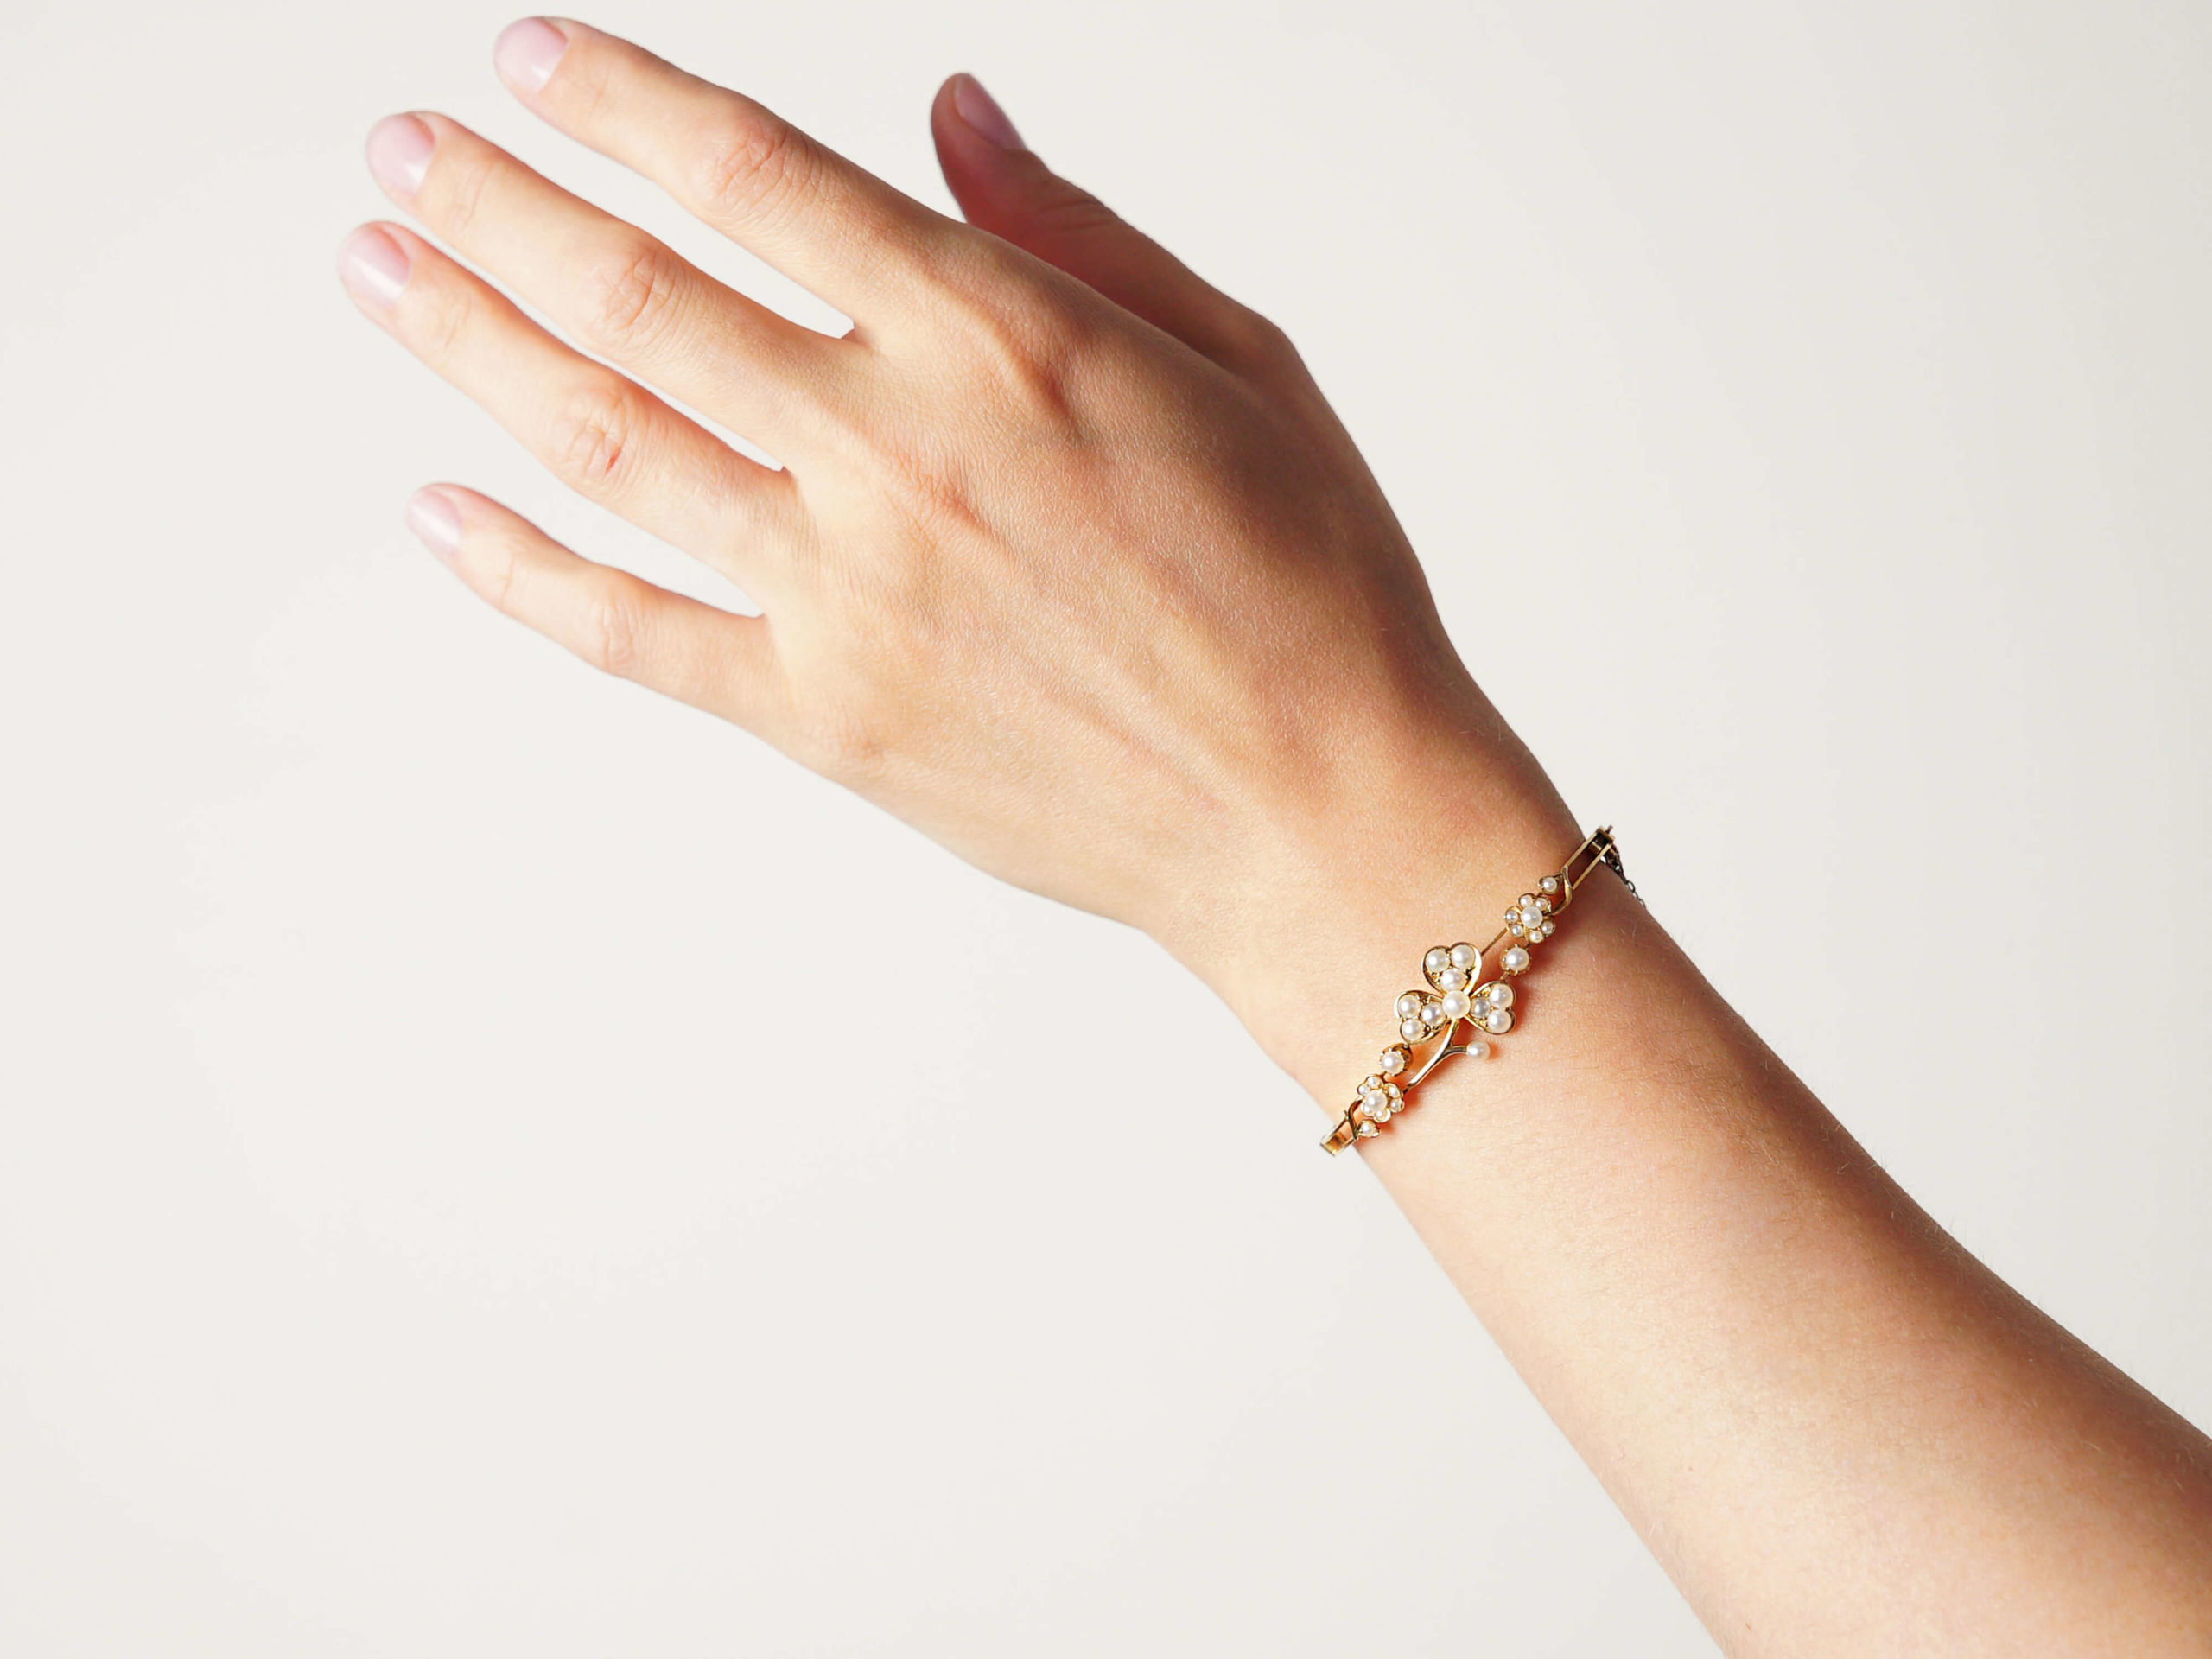 Edwardian 15ct Gold & Natural Split Pearl Bangle in Original Case